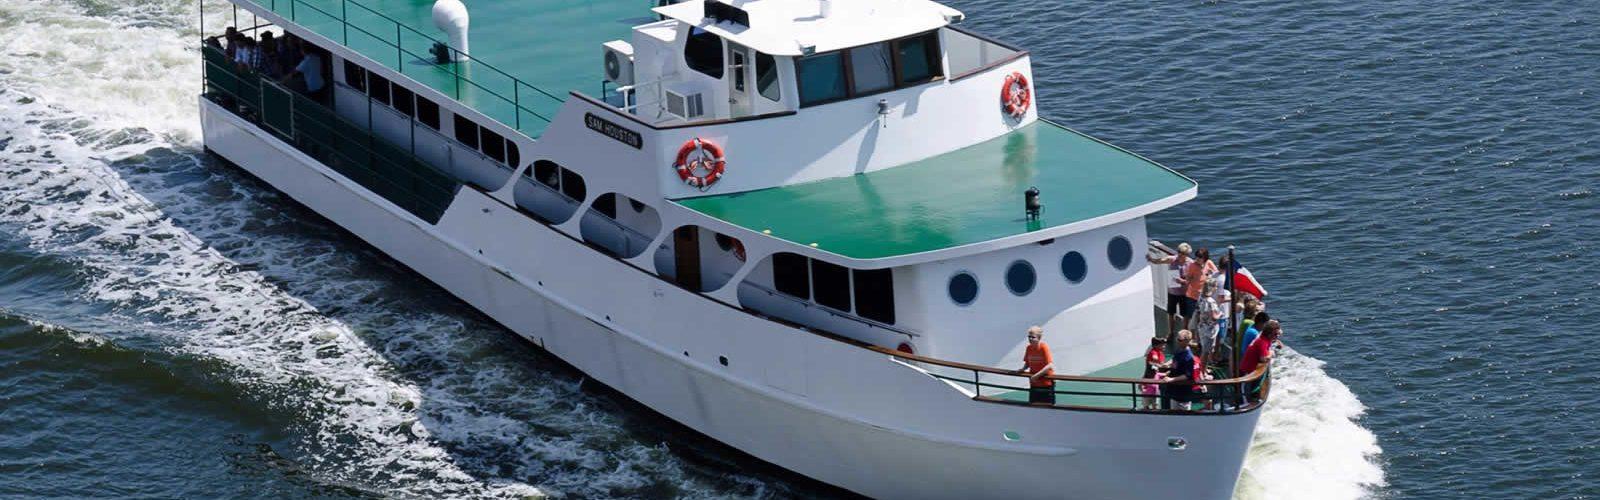 sam-houston-boat-tours-texas-2-une